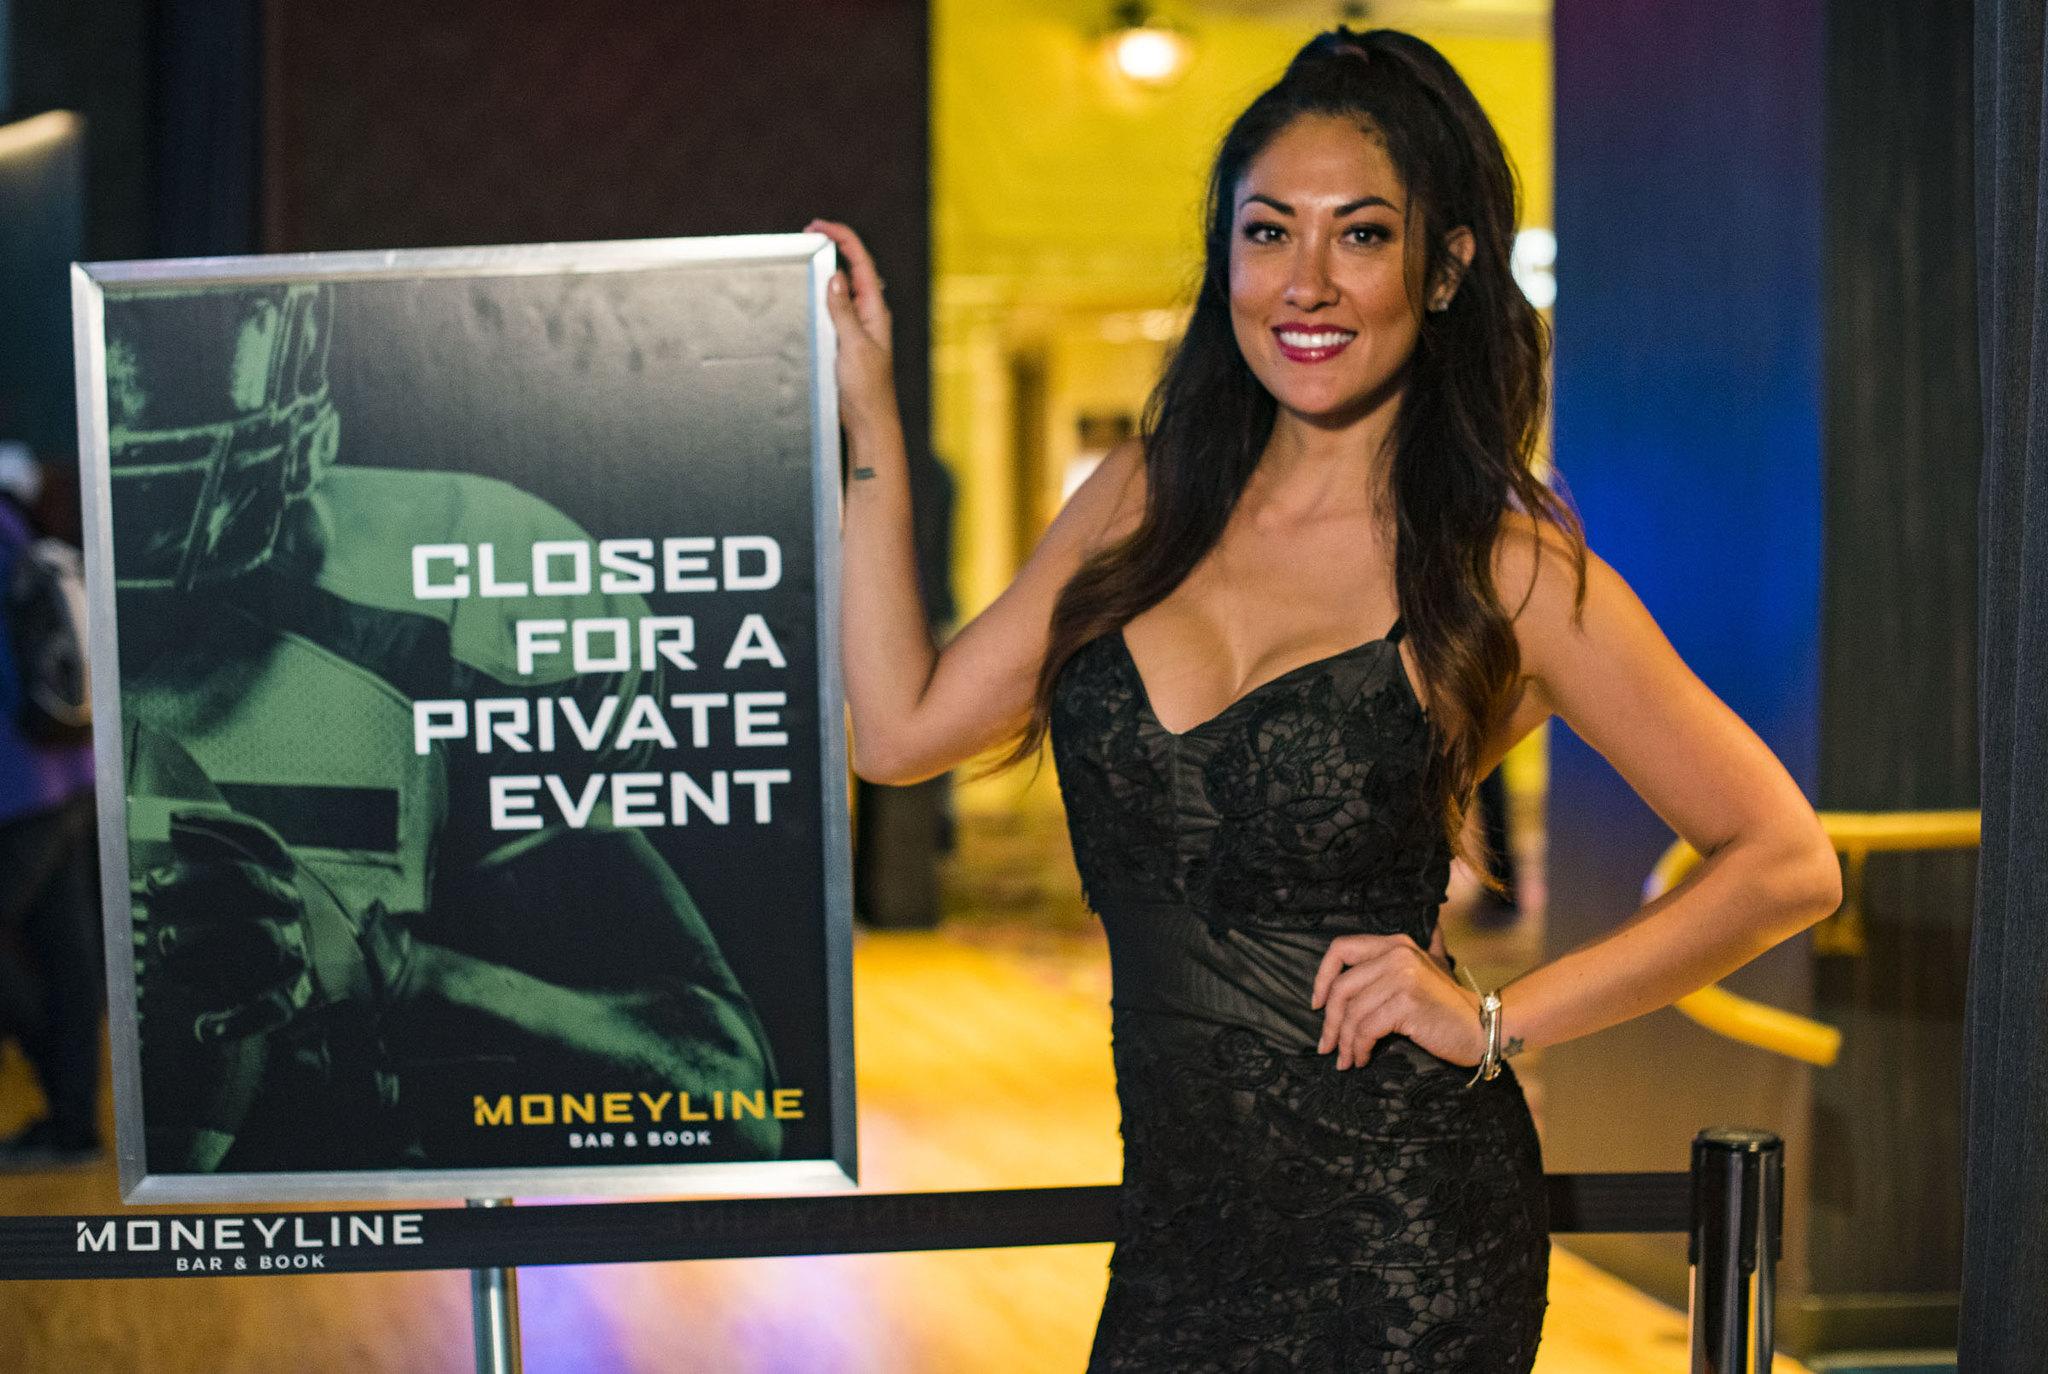 Player Party WPT Borgata Poker Open Season 18 Moneyline Sports Book